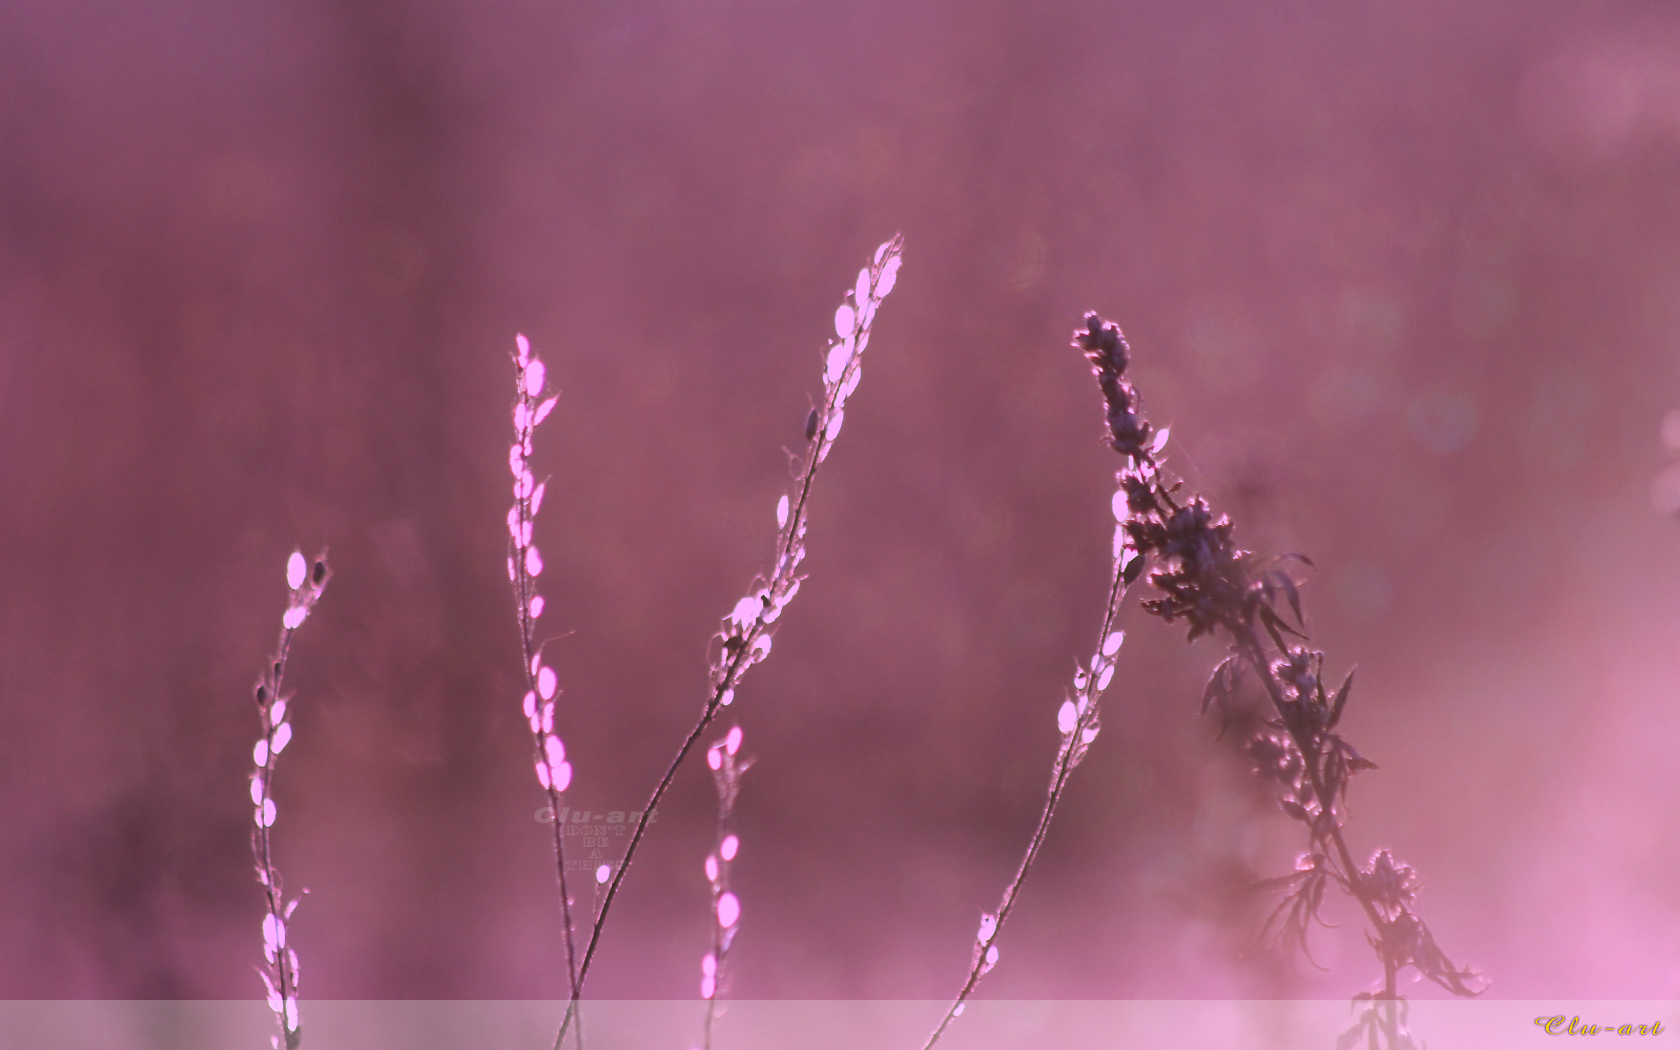 Morning Mist on the Meadow Wallpaper by Clu-art